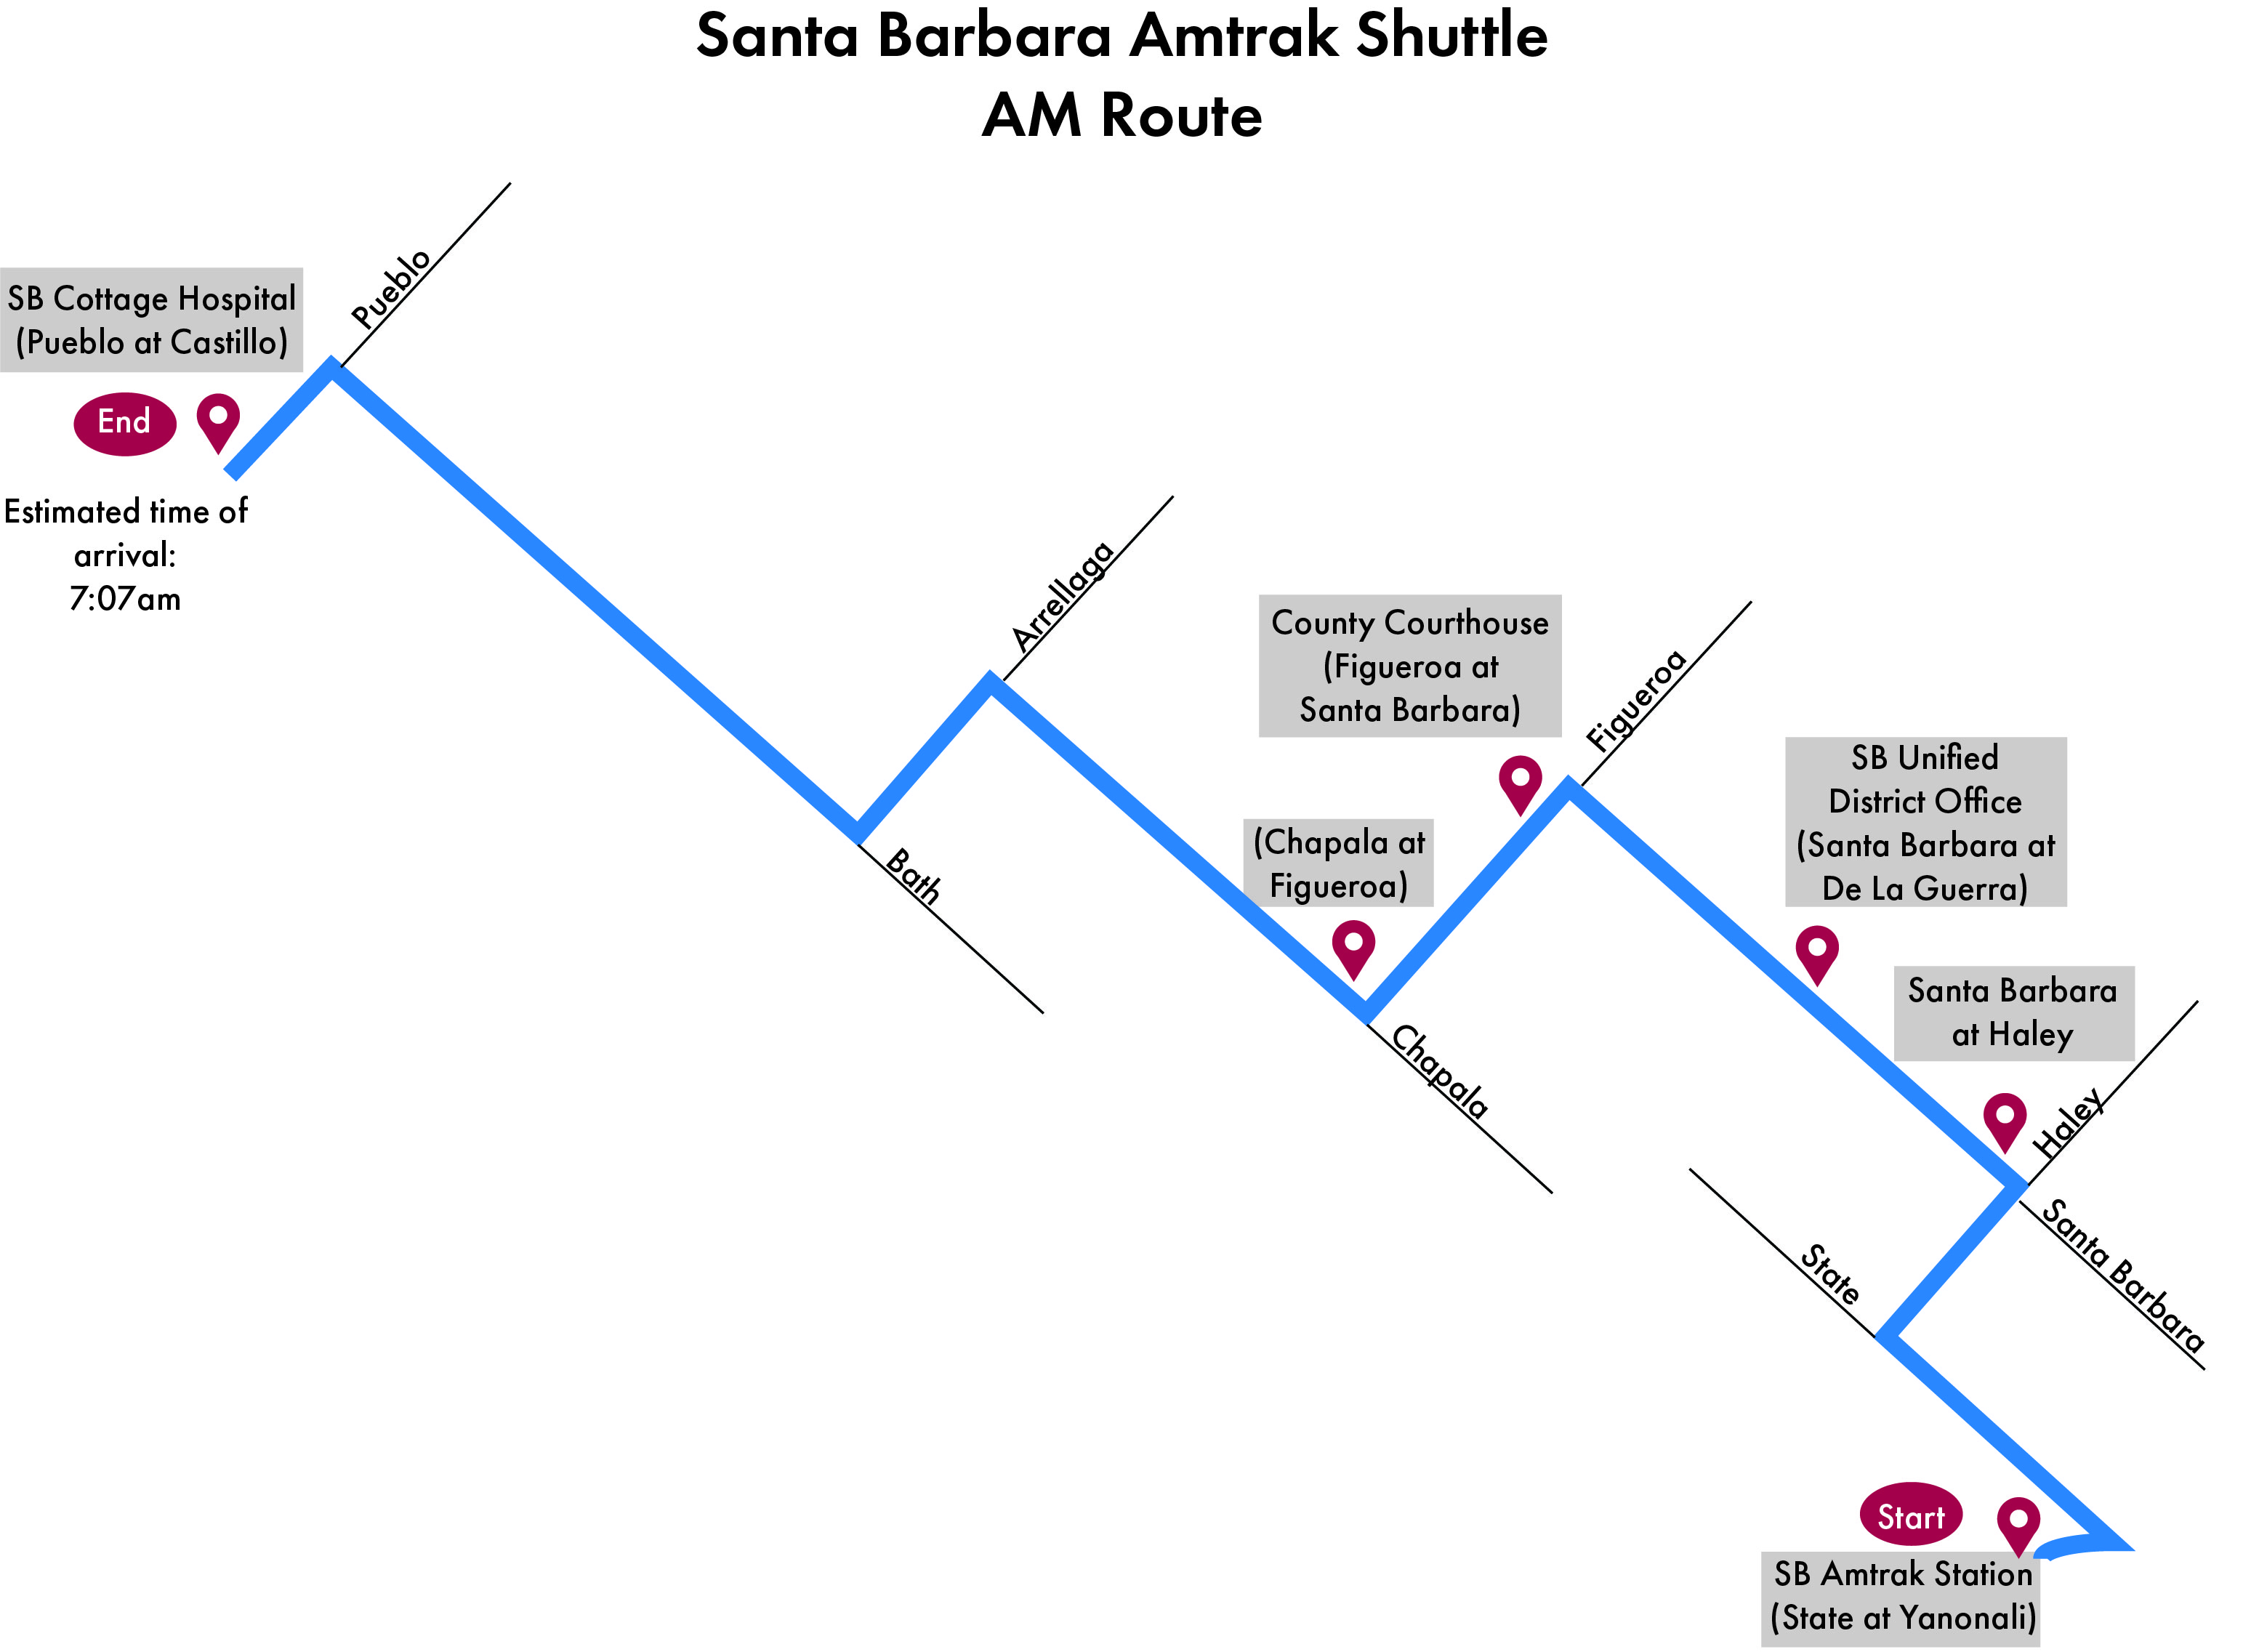 Travel – Santa Barbara MTD on montebello bus map, cleveland bus map, st. louis bus map, mobile bus map, tulsa bus map, corvallis bus map, saint paul bus map, savannah bus map, salt lake city bus map, wisconsin bus map, arizona bus map, sunnyvale bus map, albany bus map, fullerton bus map, mesa bus map, honolulu city bus map, norwalk bus map, uva bus map, california bus map, escondido bus map,